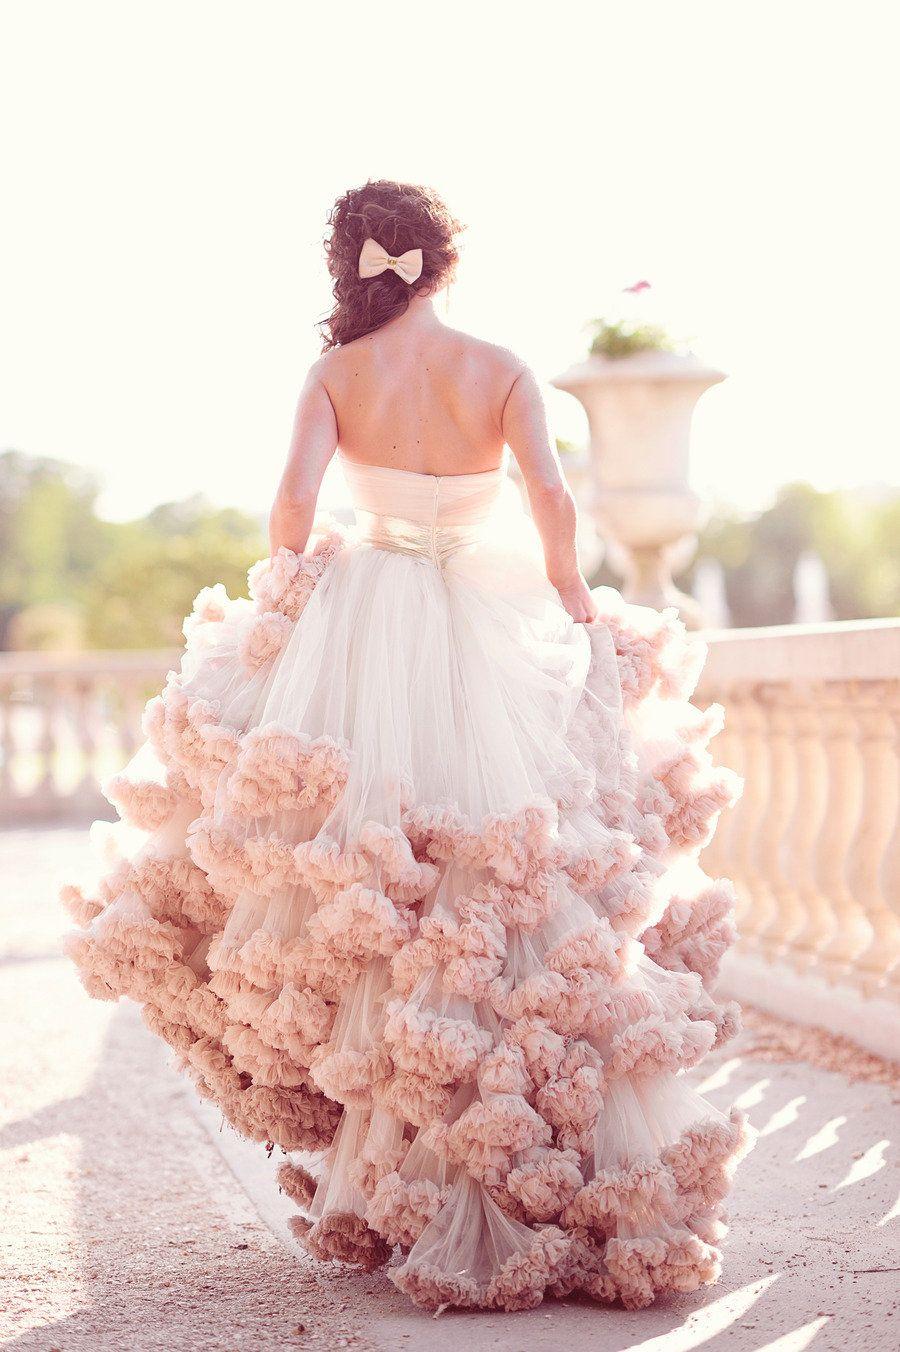 Paris Honeymoon Photo Session from EmmPhotography | Pinterest ...